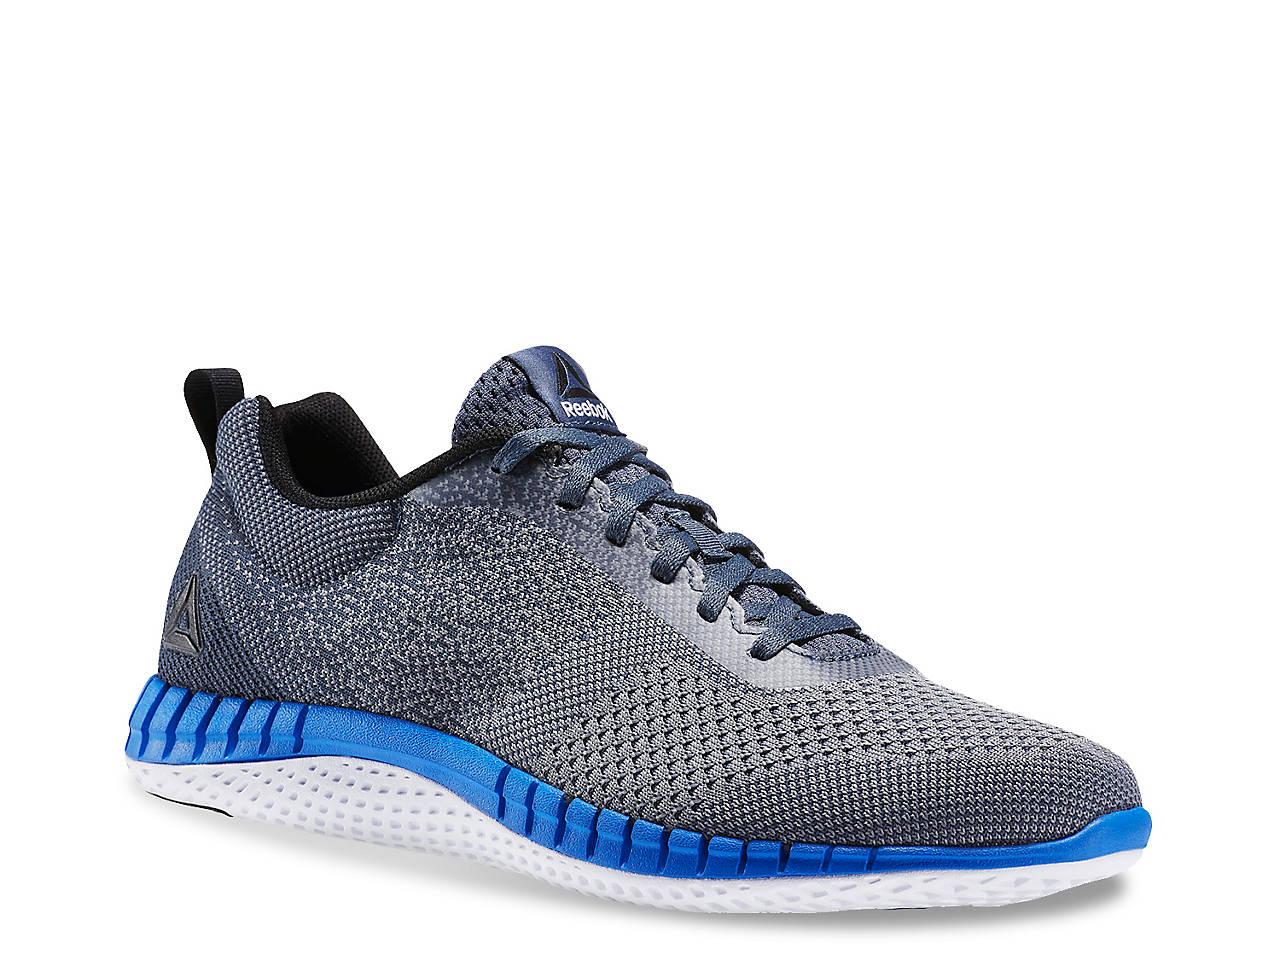 0262667018e Reebok Print Run Prime Running Shoe - Men s Men s Shoes